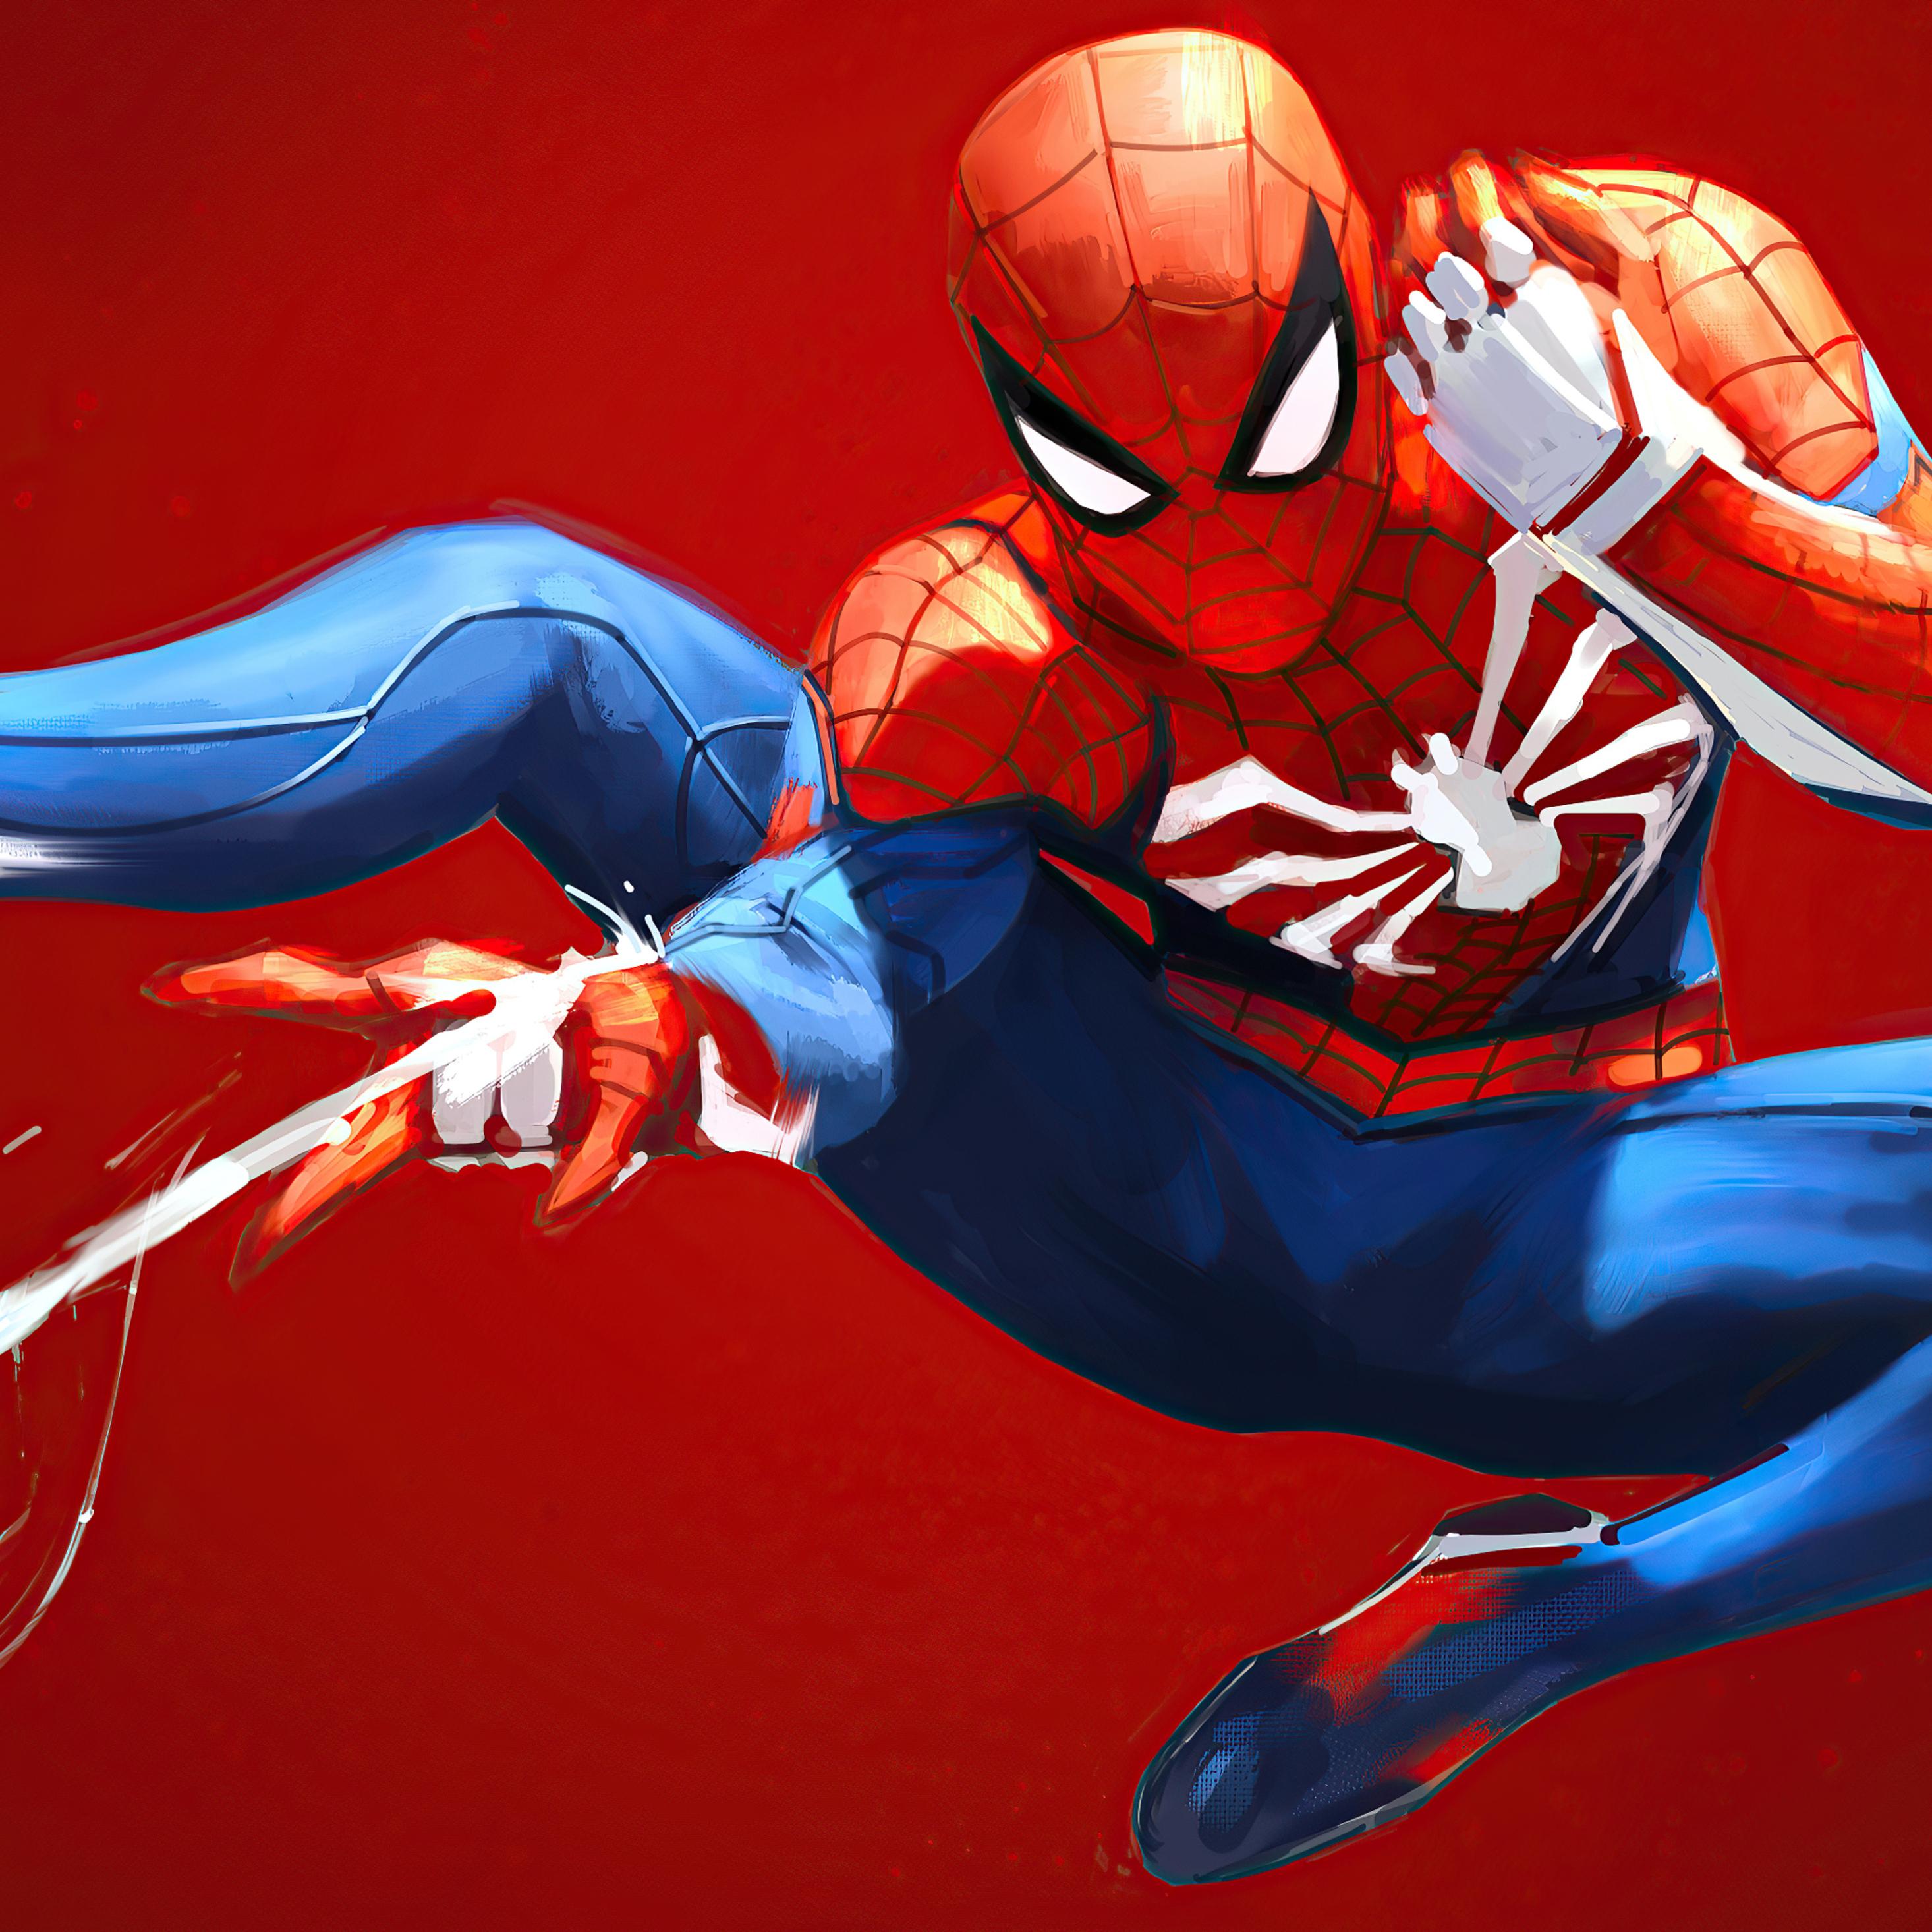 2932x2932 Spider Man Web Shooter 4k Ipad Pro Retina ...